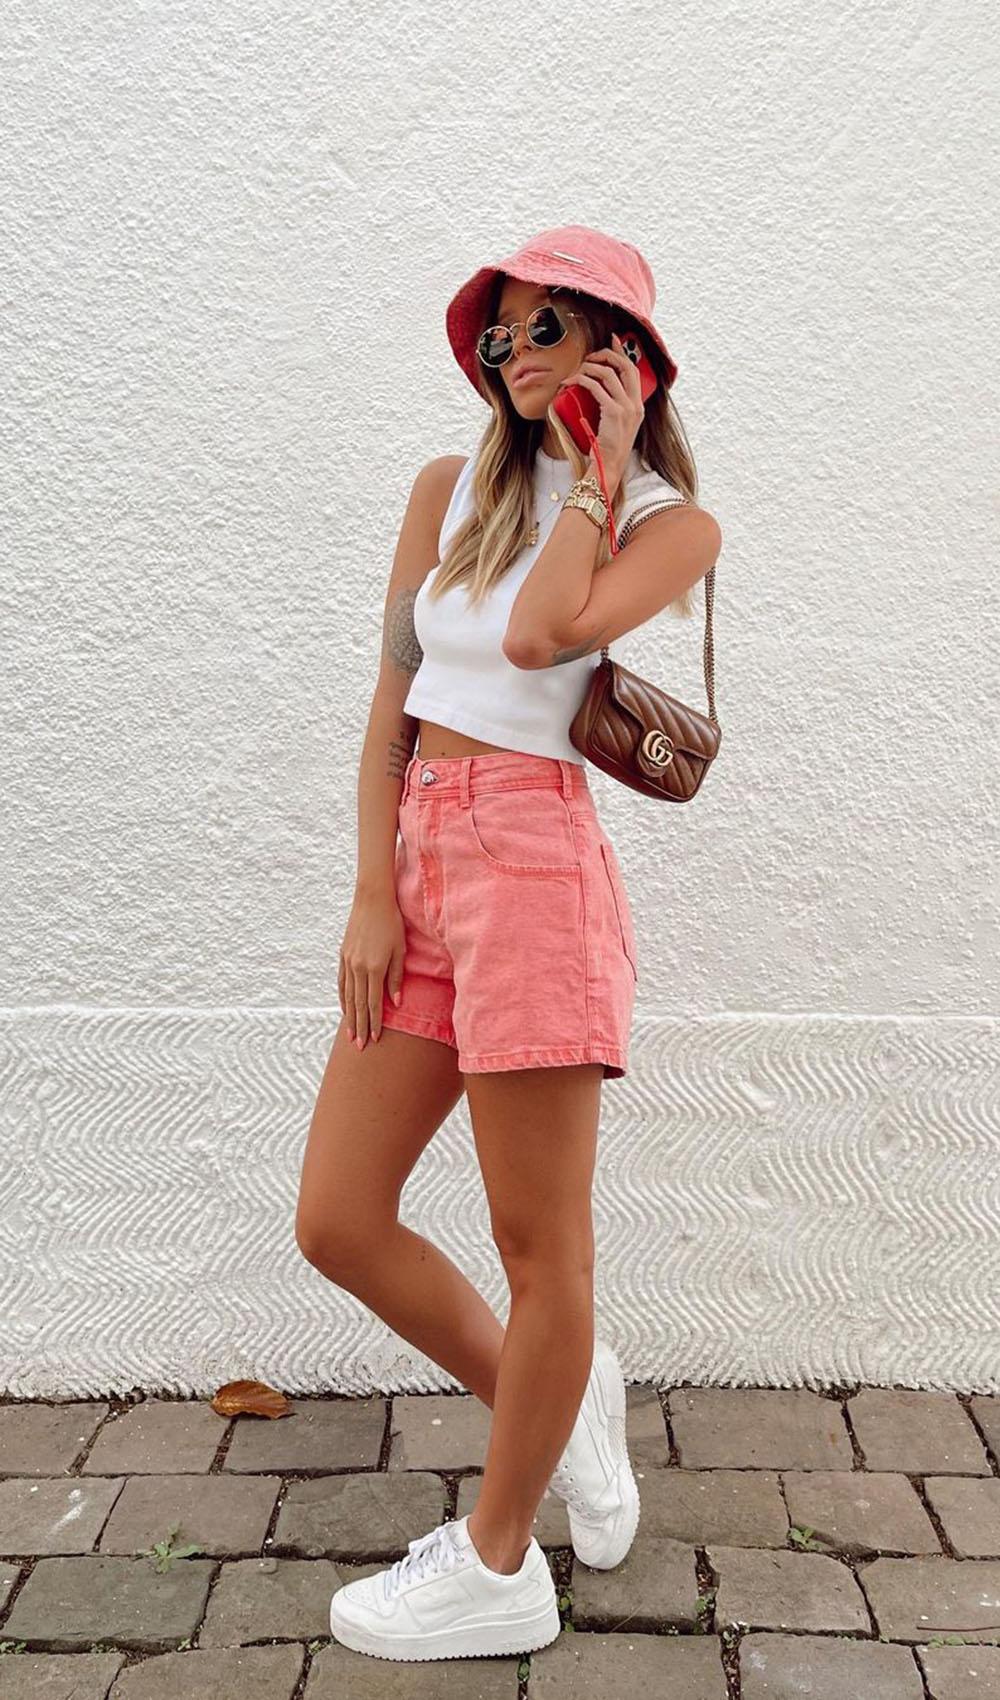 Regata branca com shortinho rosa, bucket hat e tênis branco